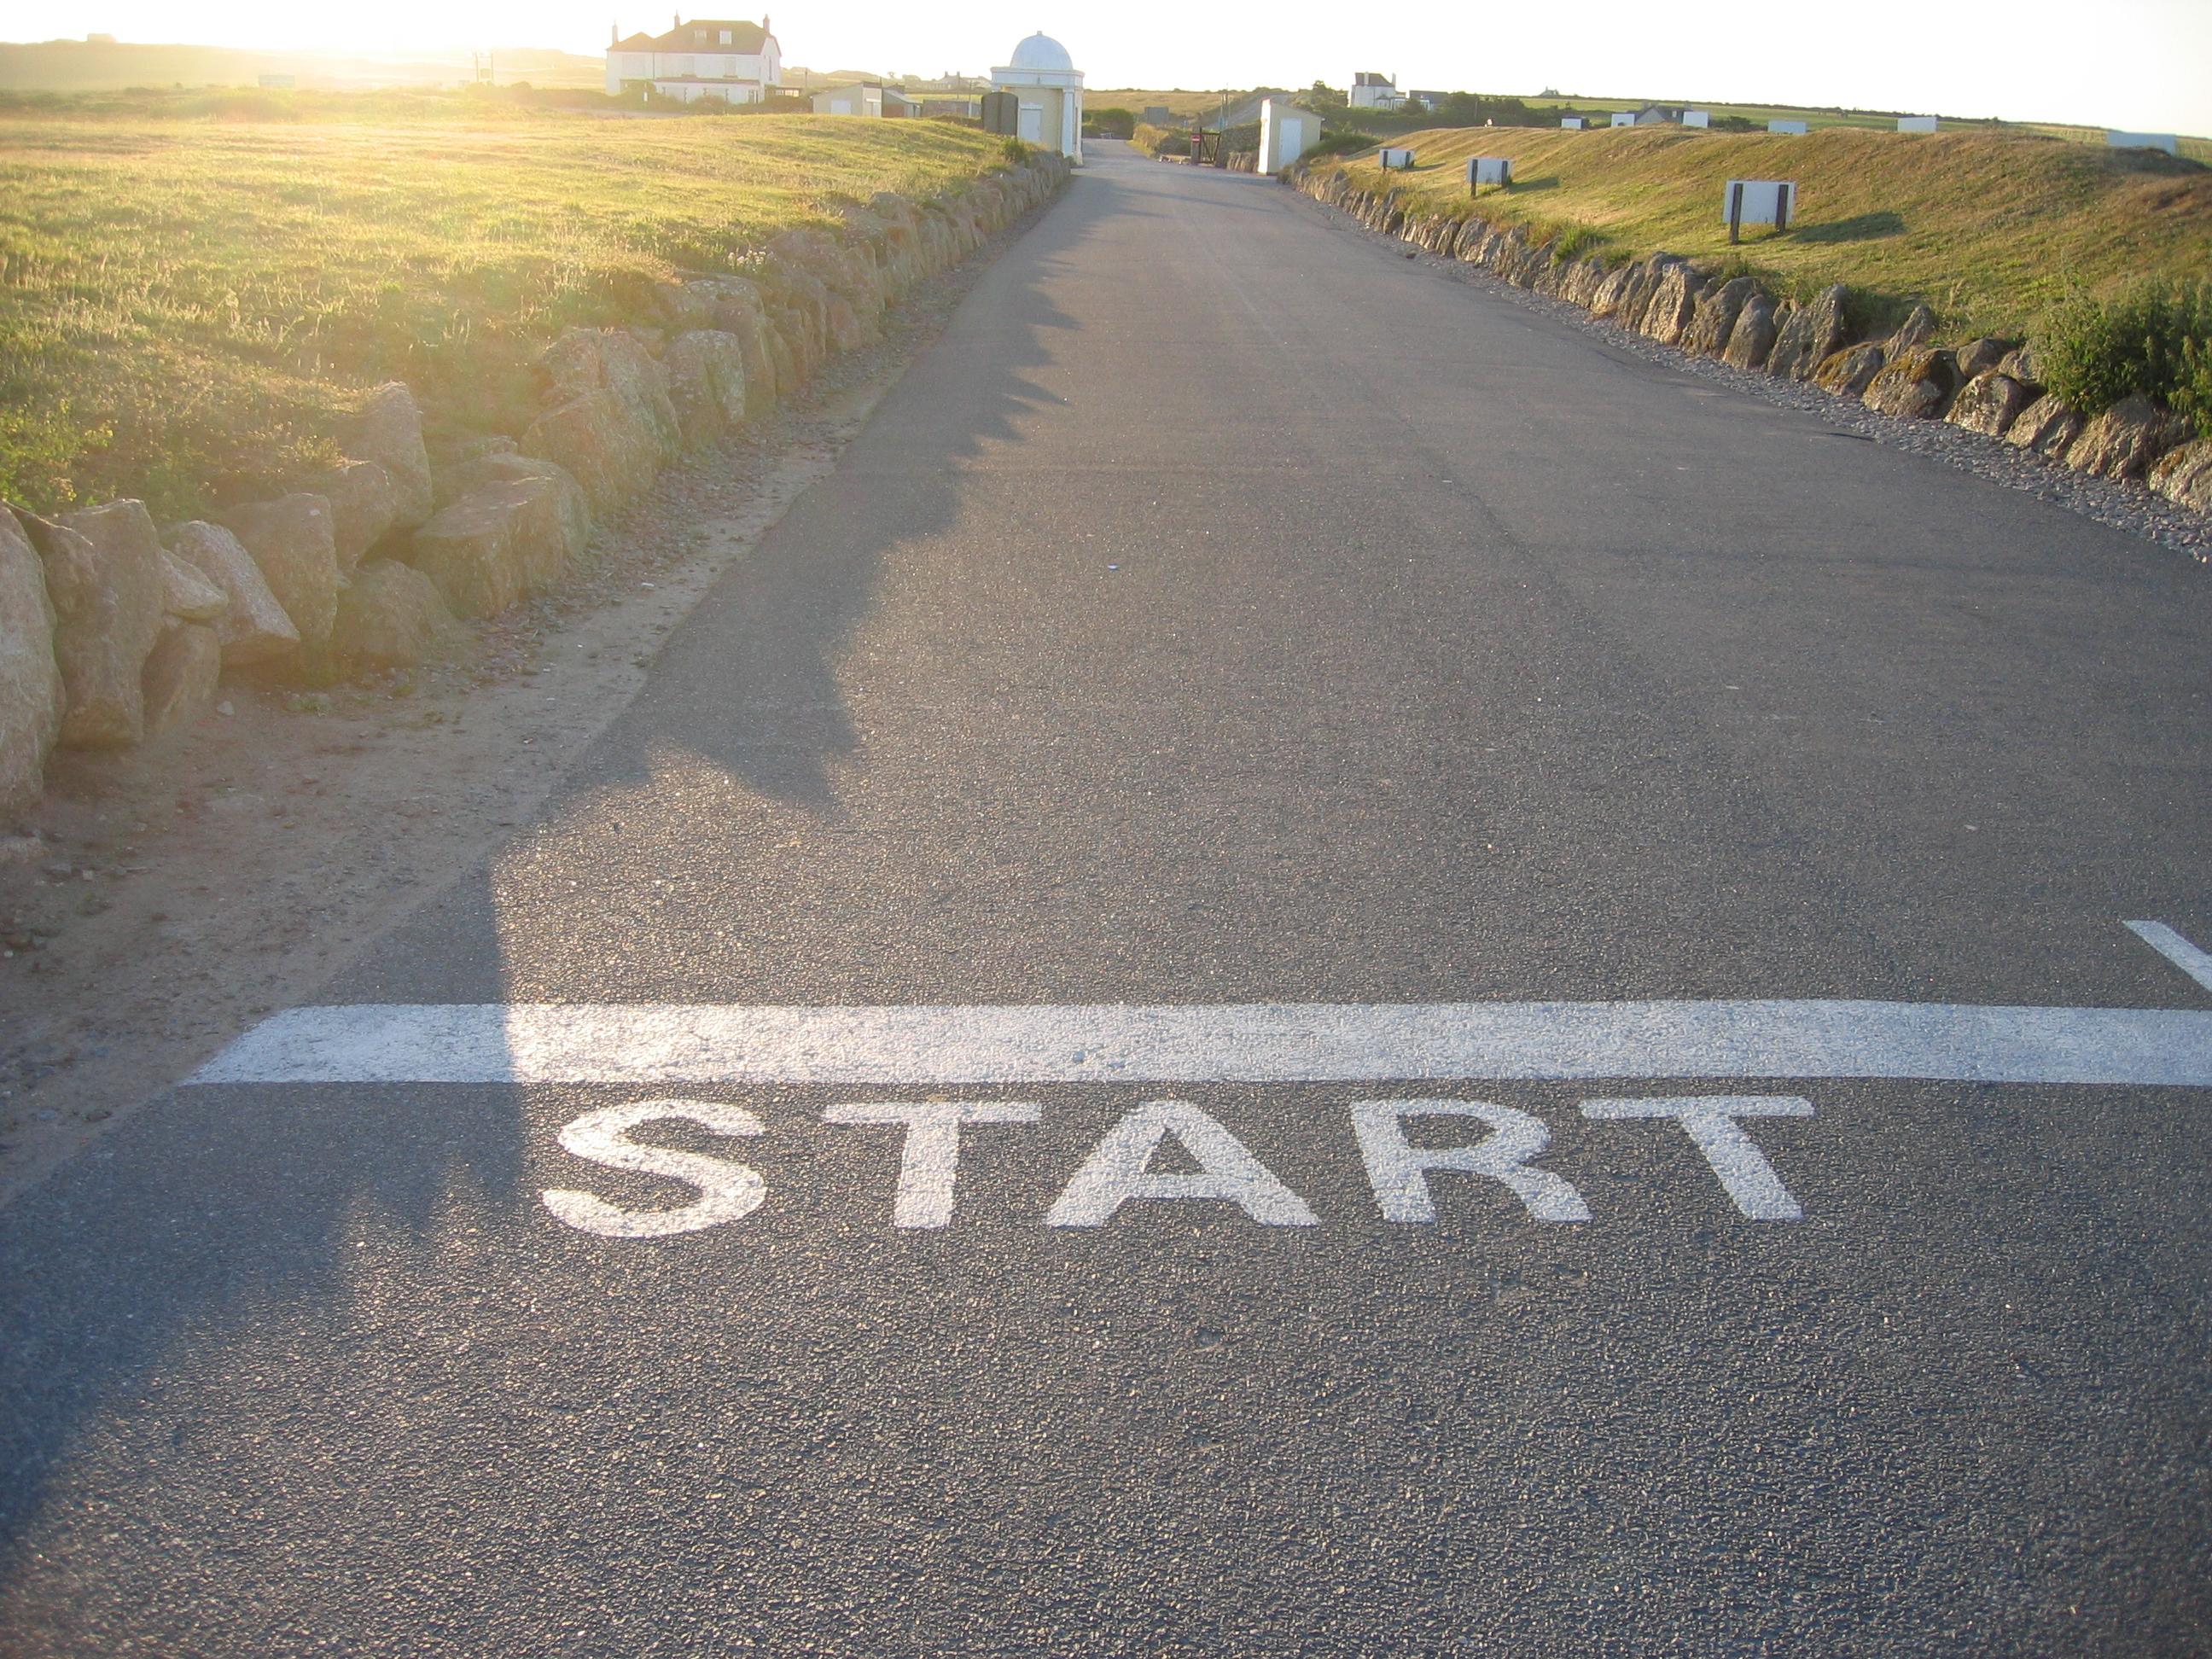 Startyourcareer_Outsorcing advisors